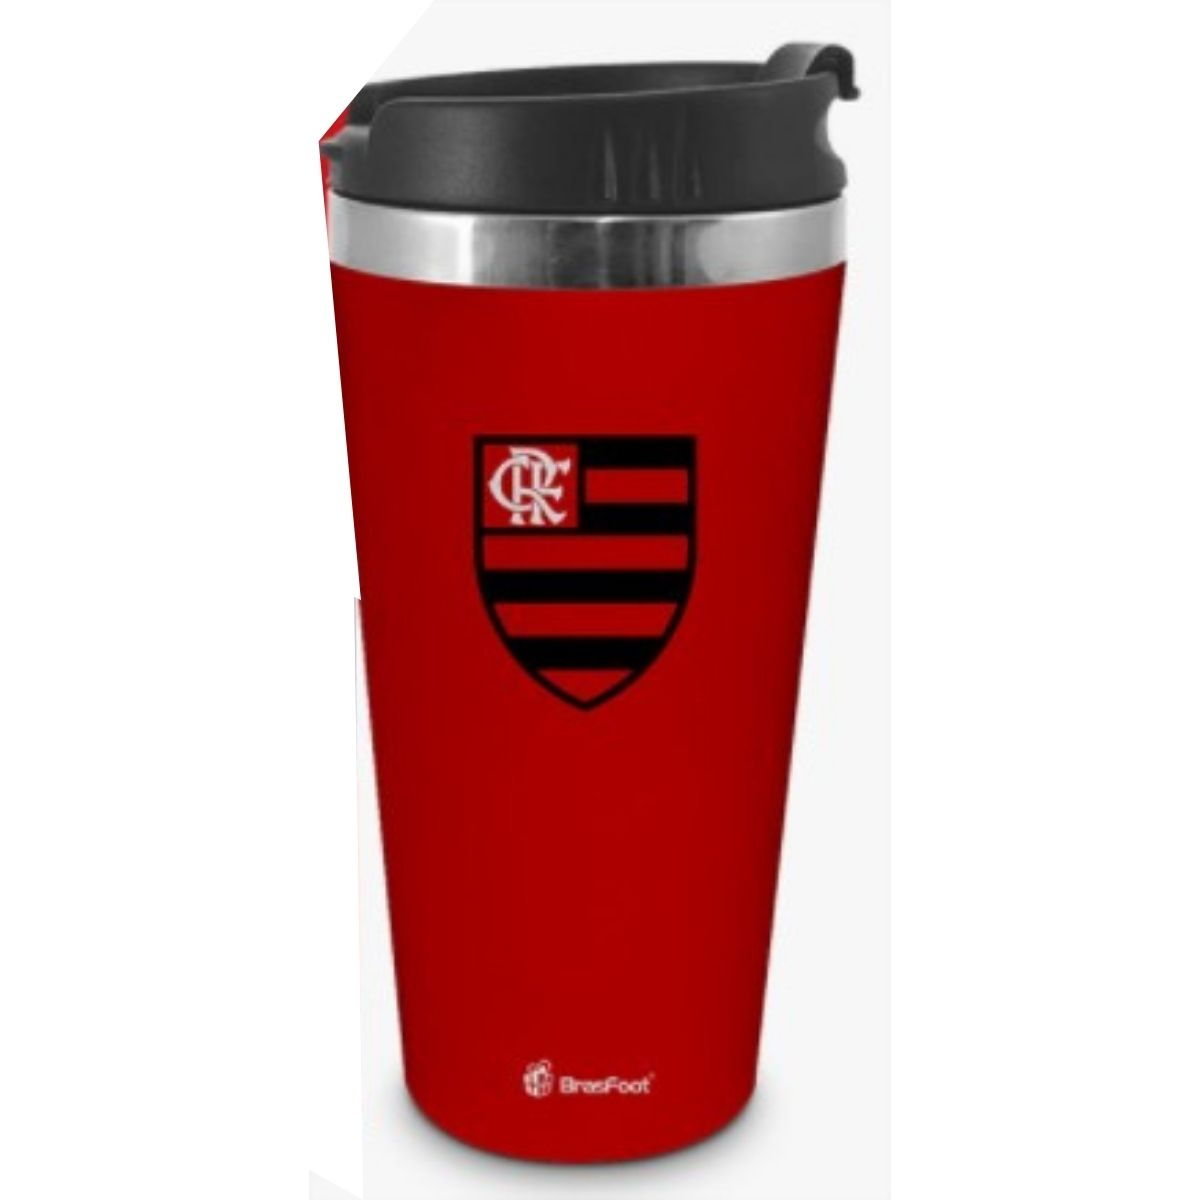 Copo Térmico Inox Emborrachado Flamengo 450ml Brasfoot